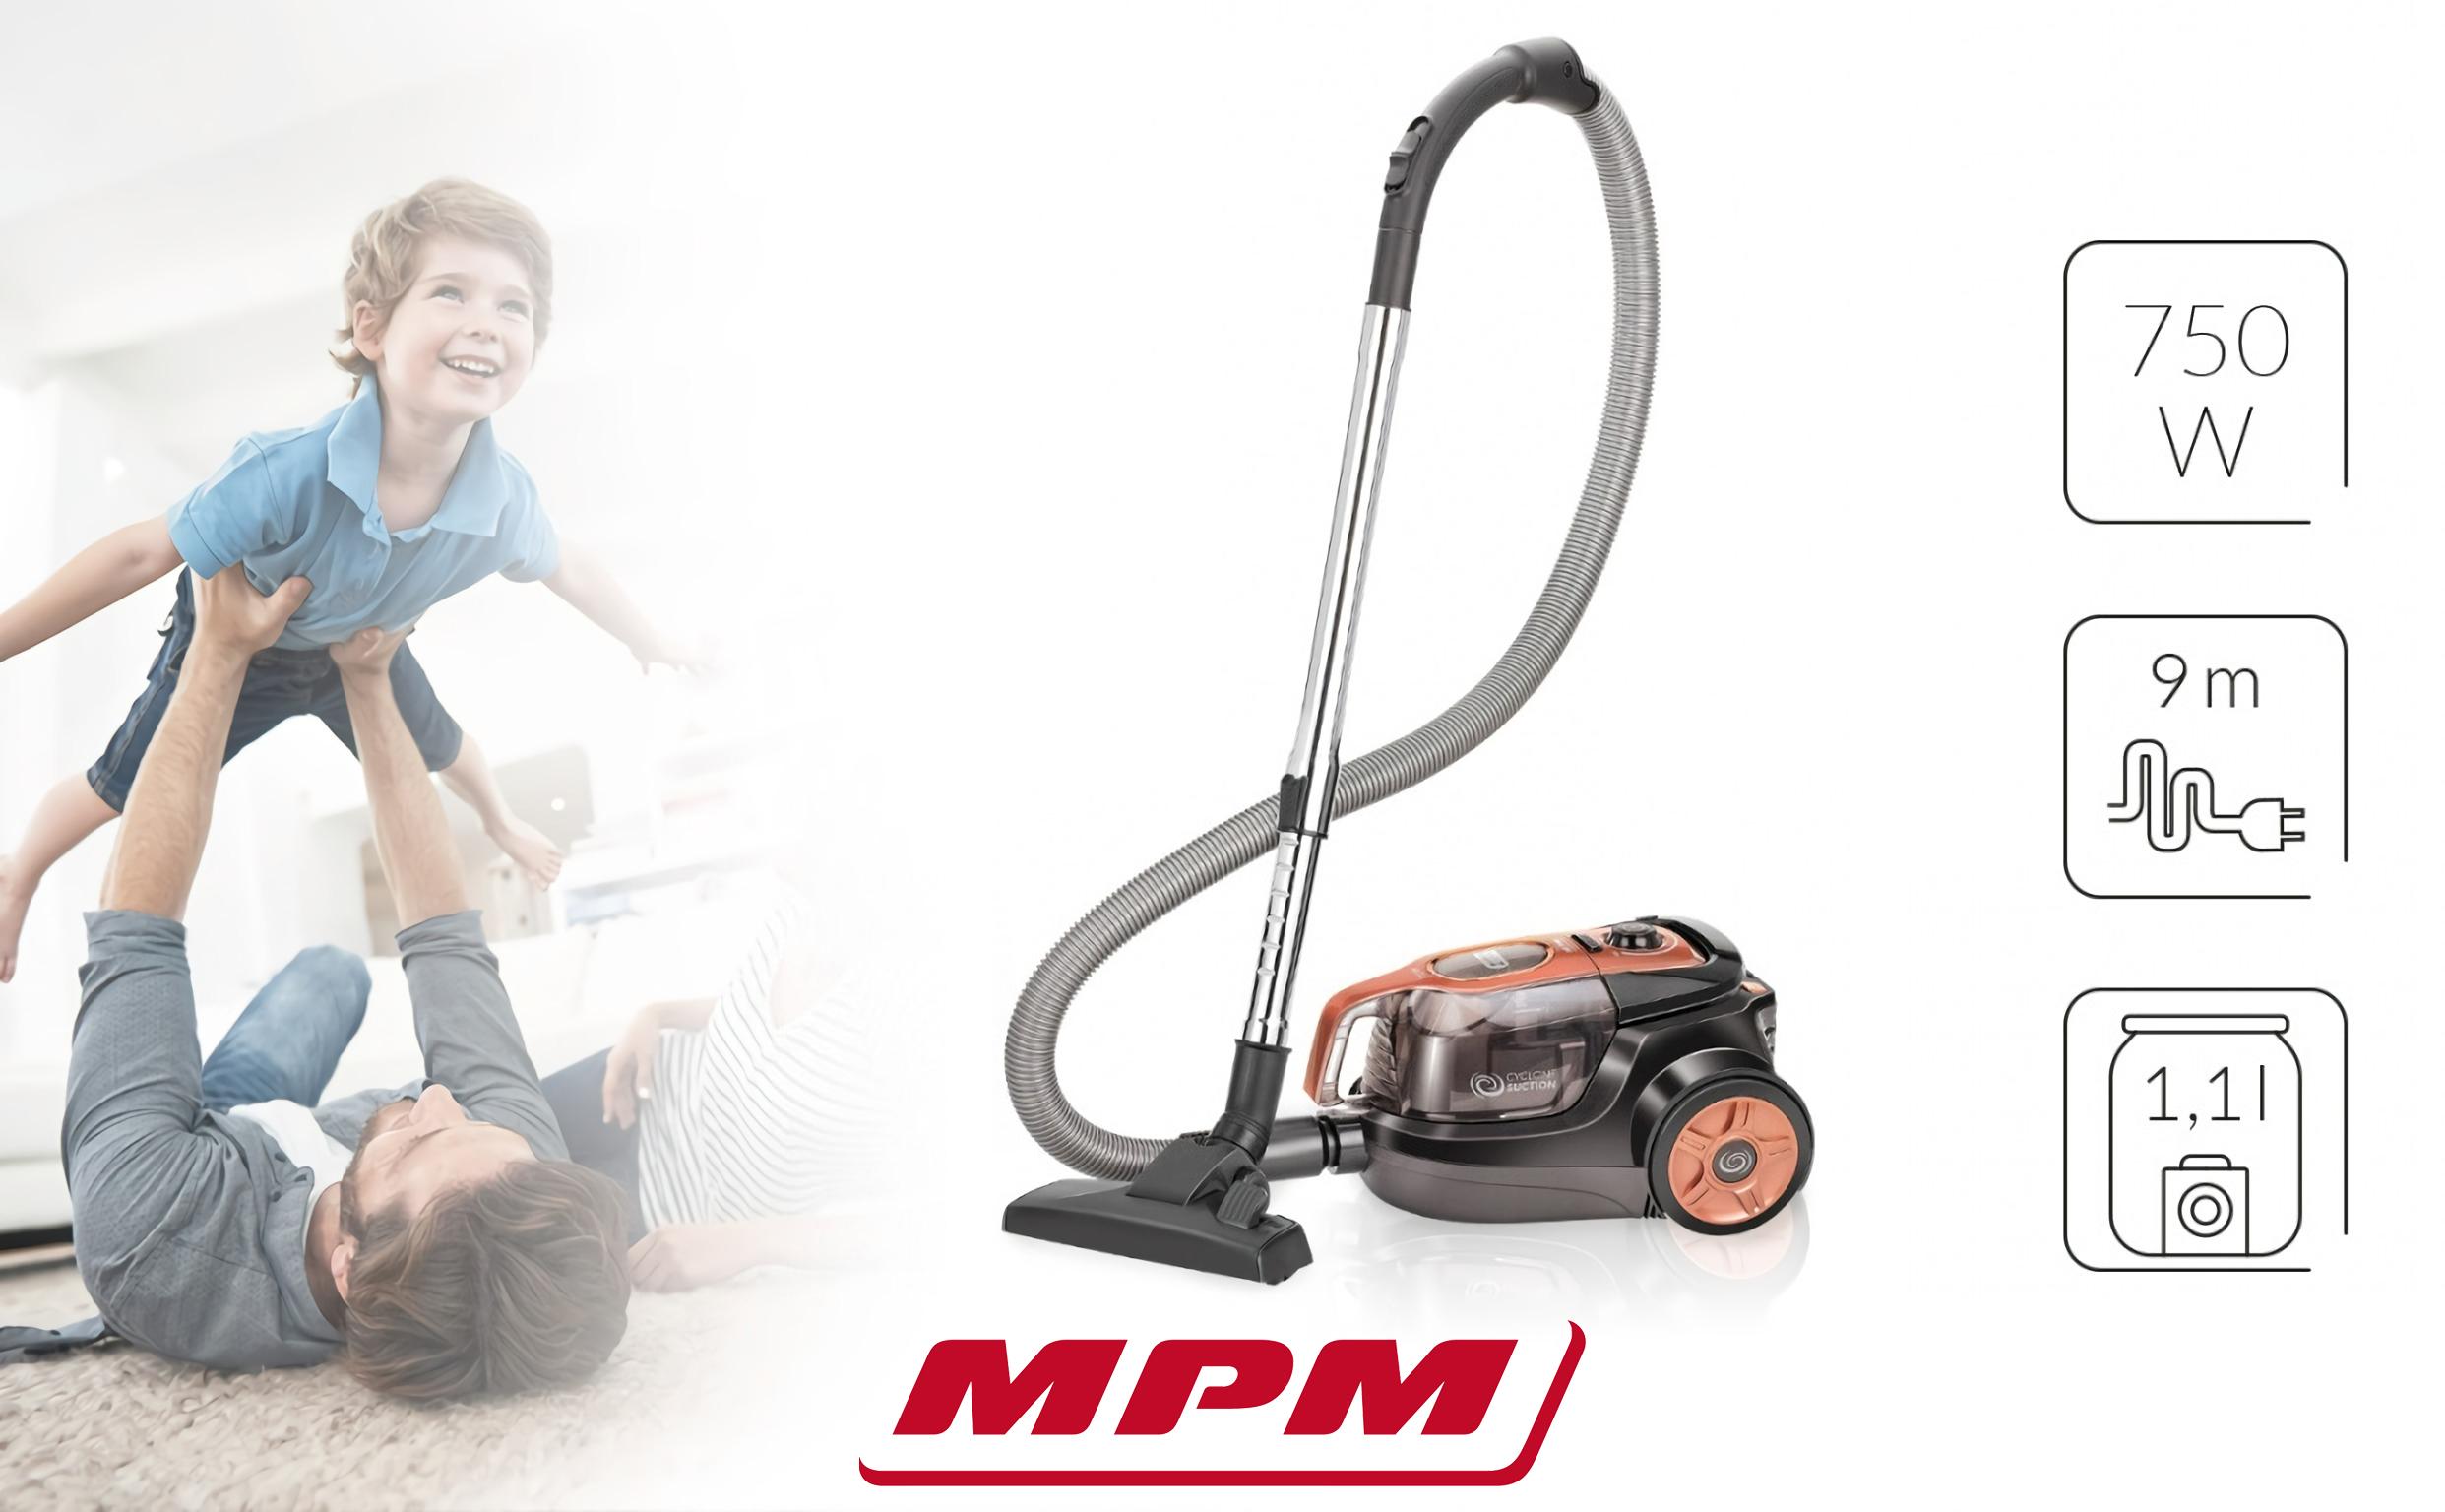 MPM MOD-25 Aspiradora Sin Bolsa Cyclonic, con Accesorios, 1.1 litros, Silencioso, Fácil Limpieza, Cable 9 metros, 750W